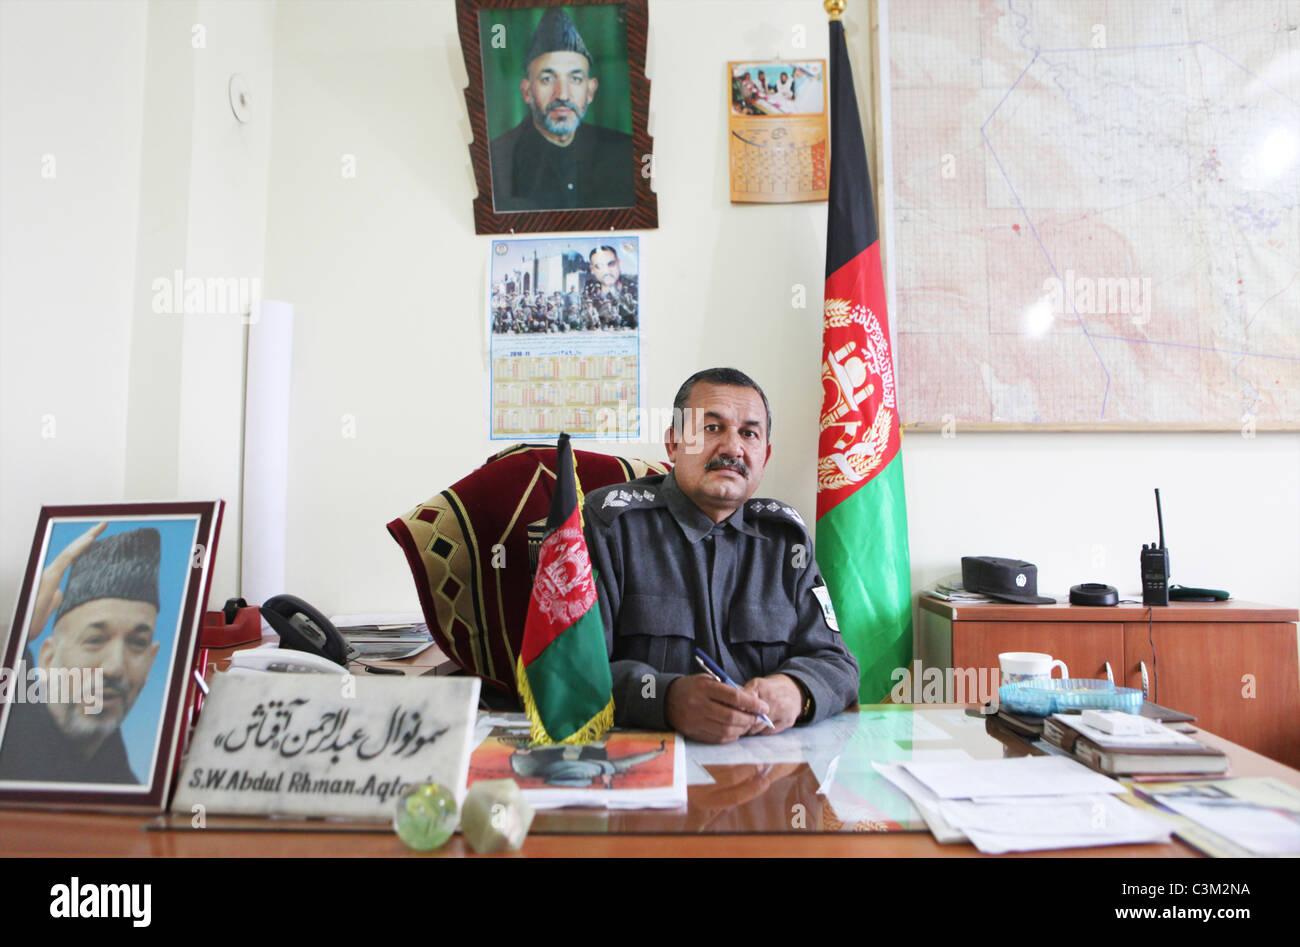 Abdul Rahman Aqtash. Head NDS and dept police chief Kunduz - Stock Image